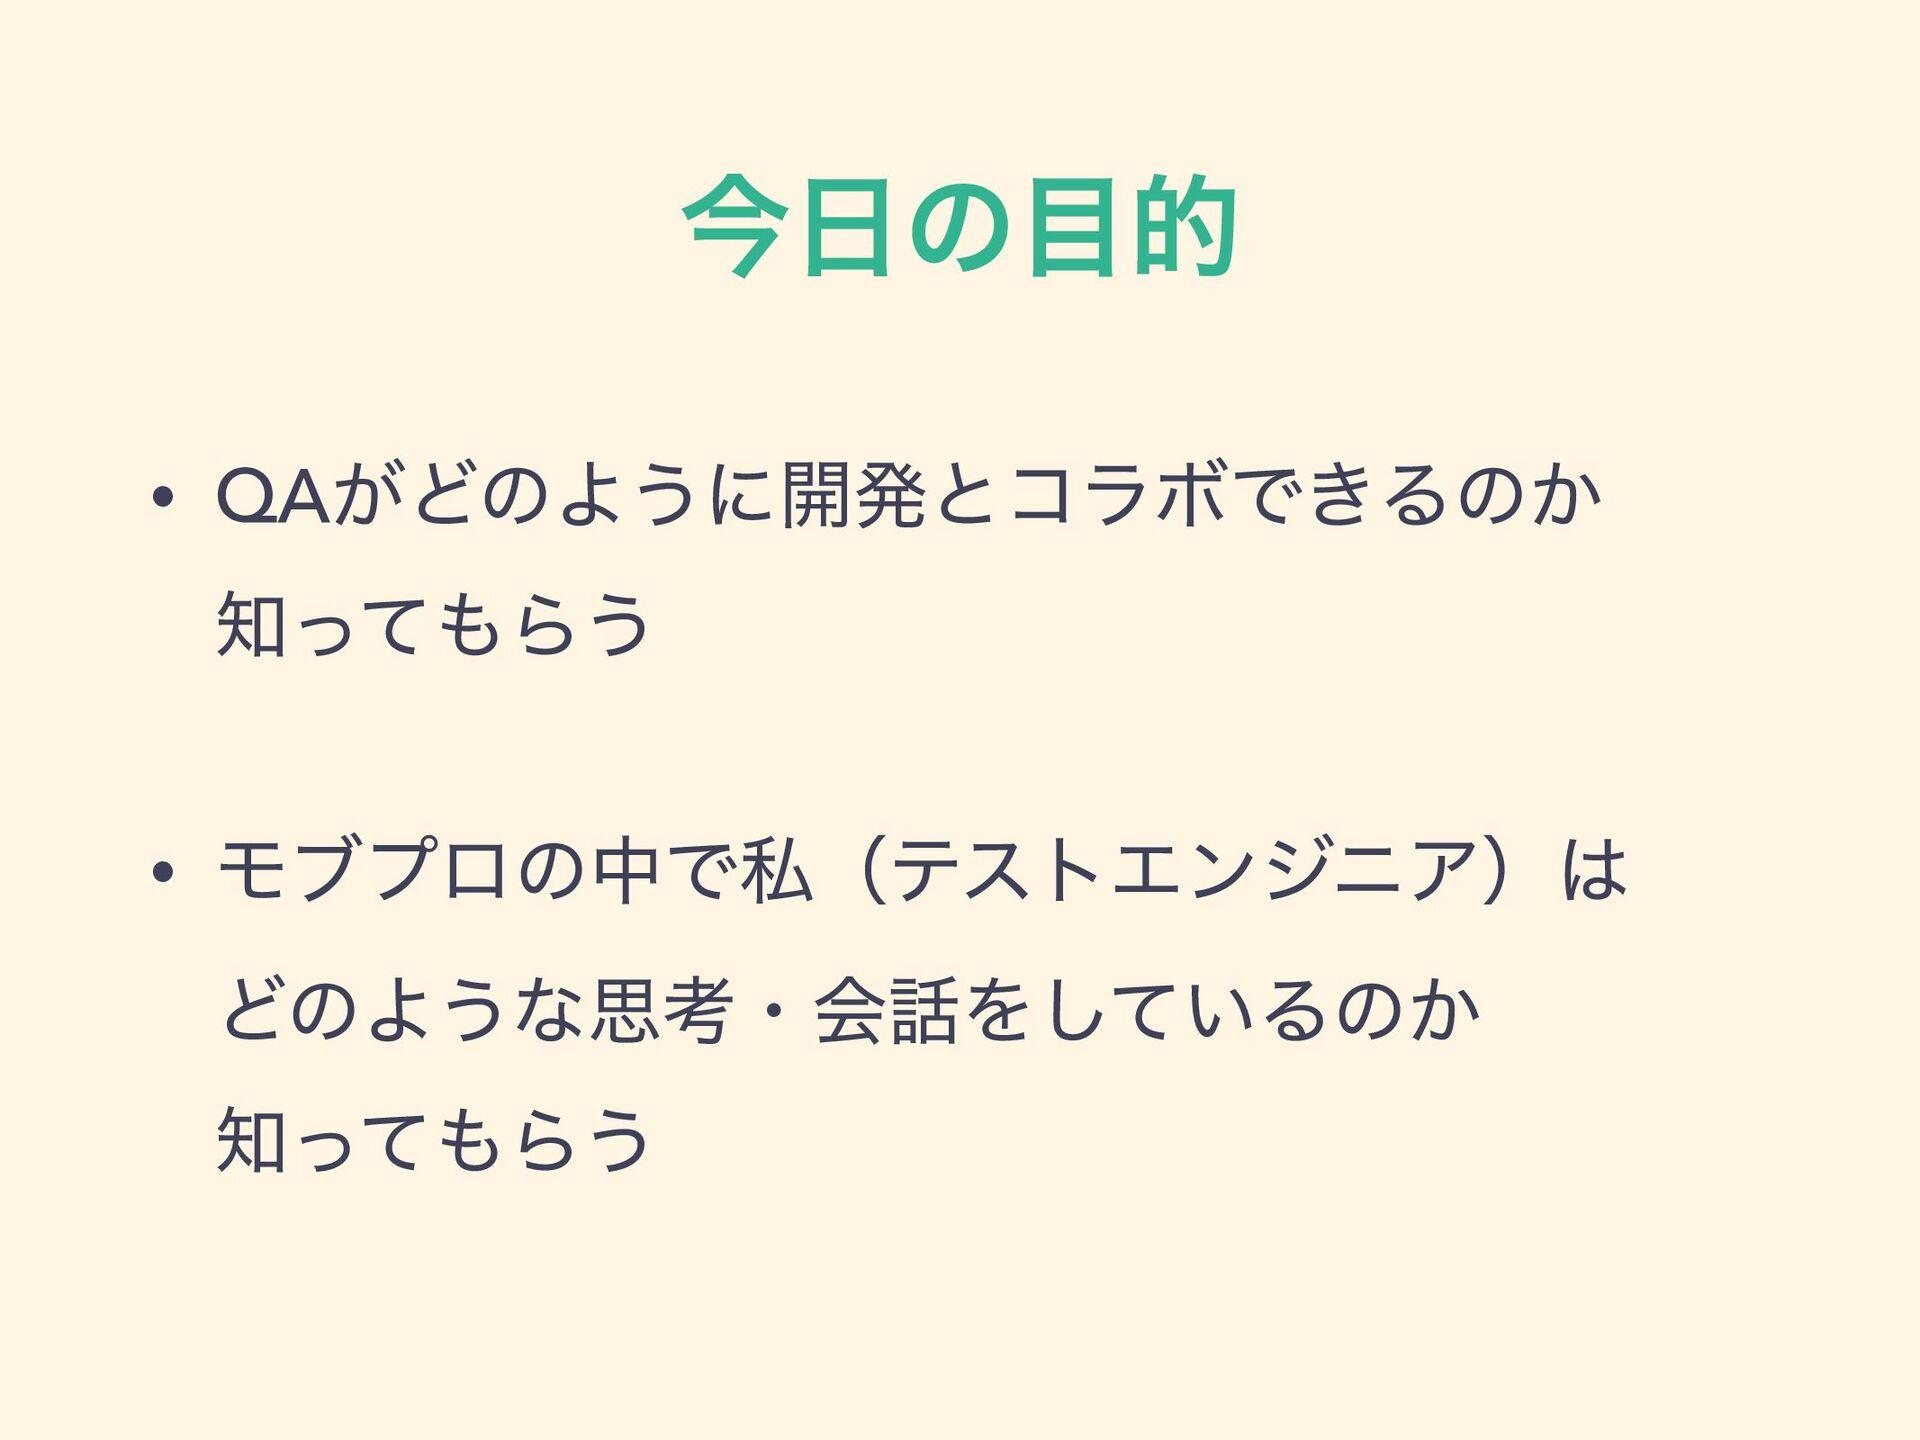 ࠓͷత • QA͕ͲͷΑ͏ʹ։ൃͱίϥϘͰ͖Δͷ͔ ͬͯΒ͏ • Agile։ൃͷҰ...